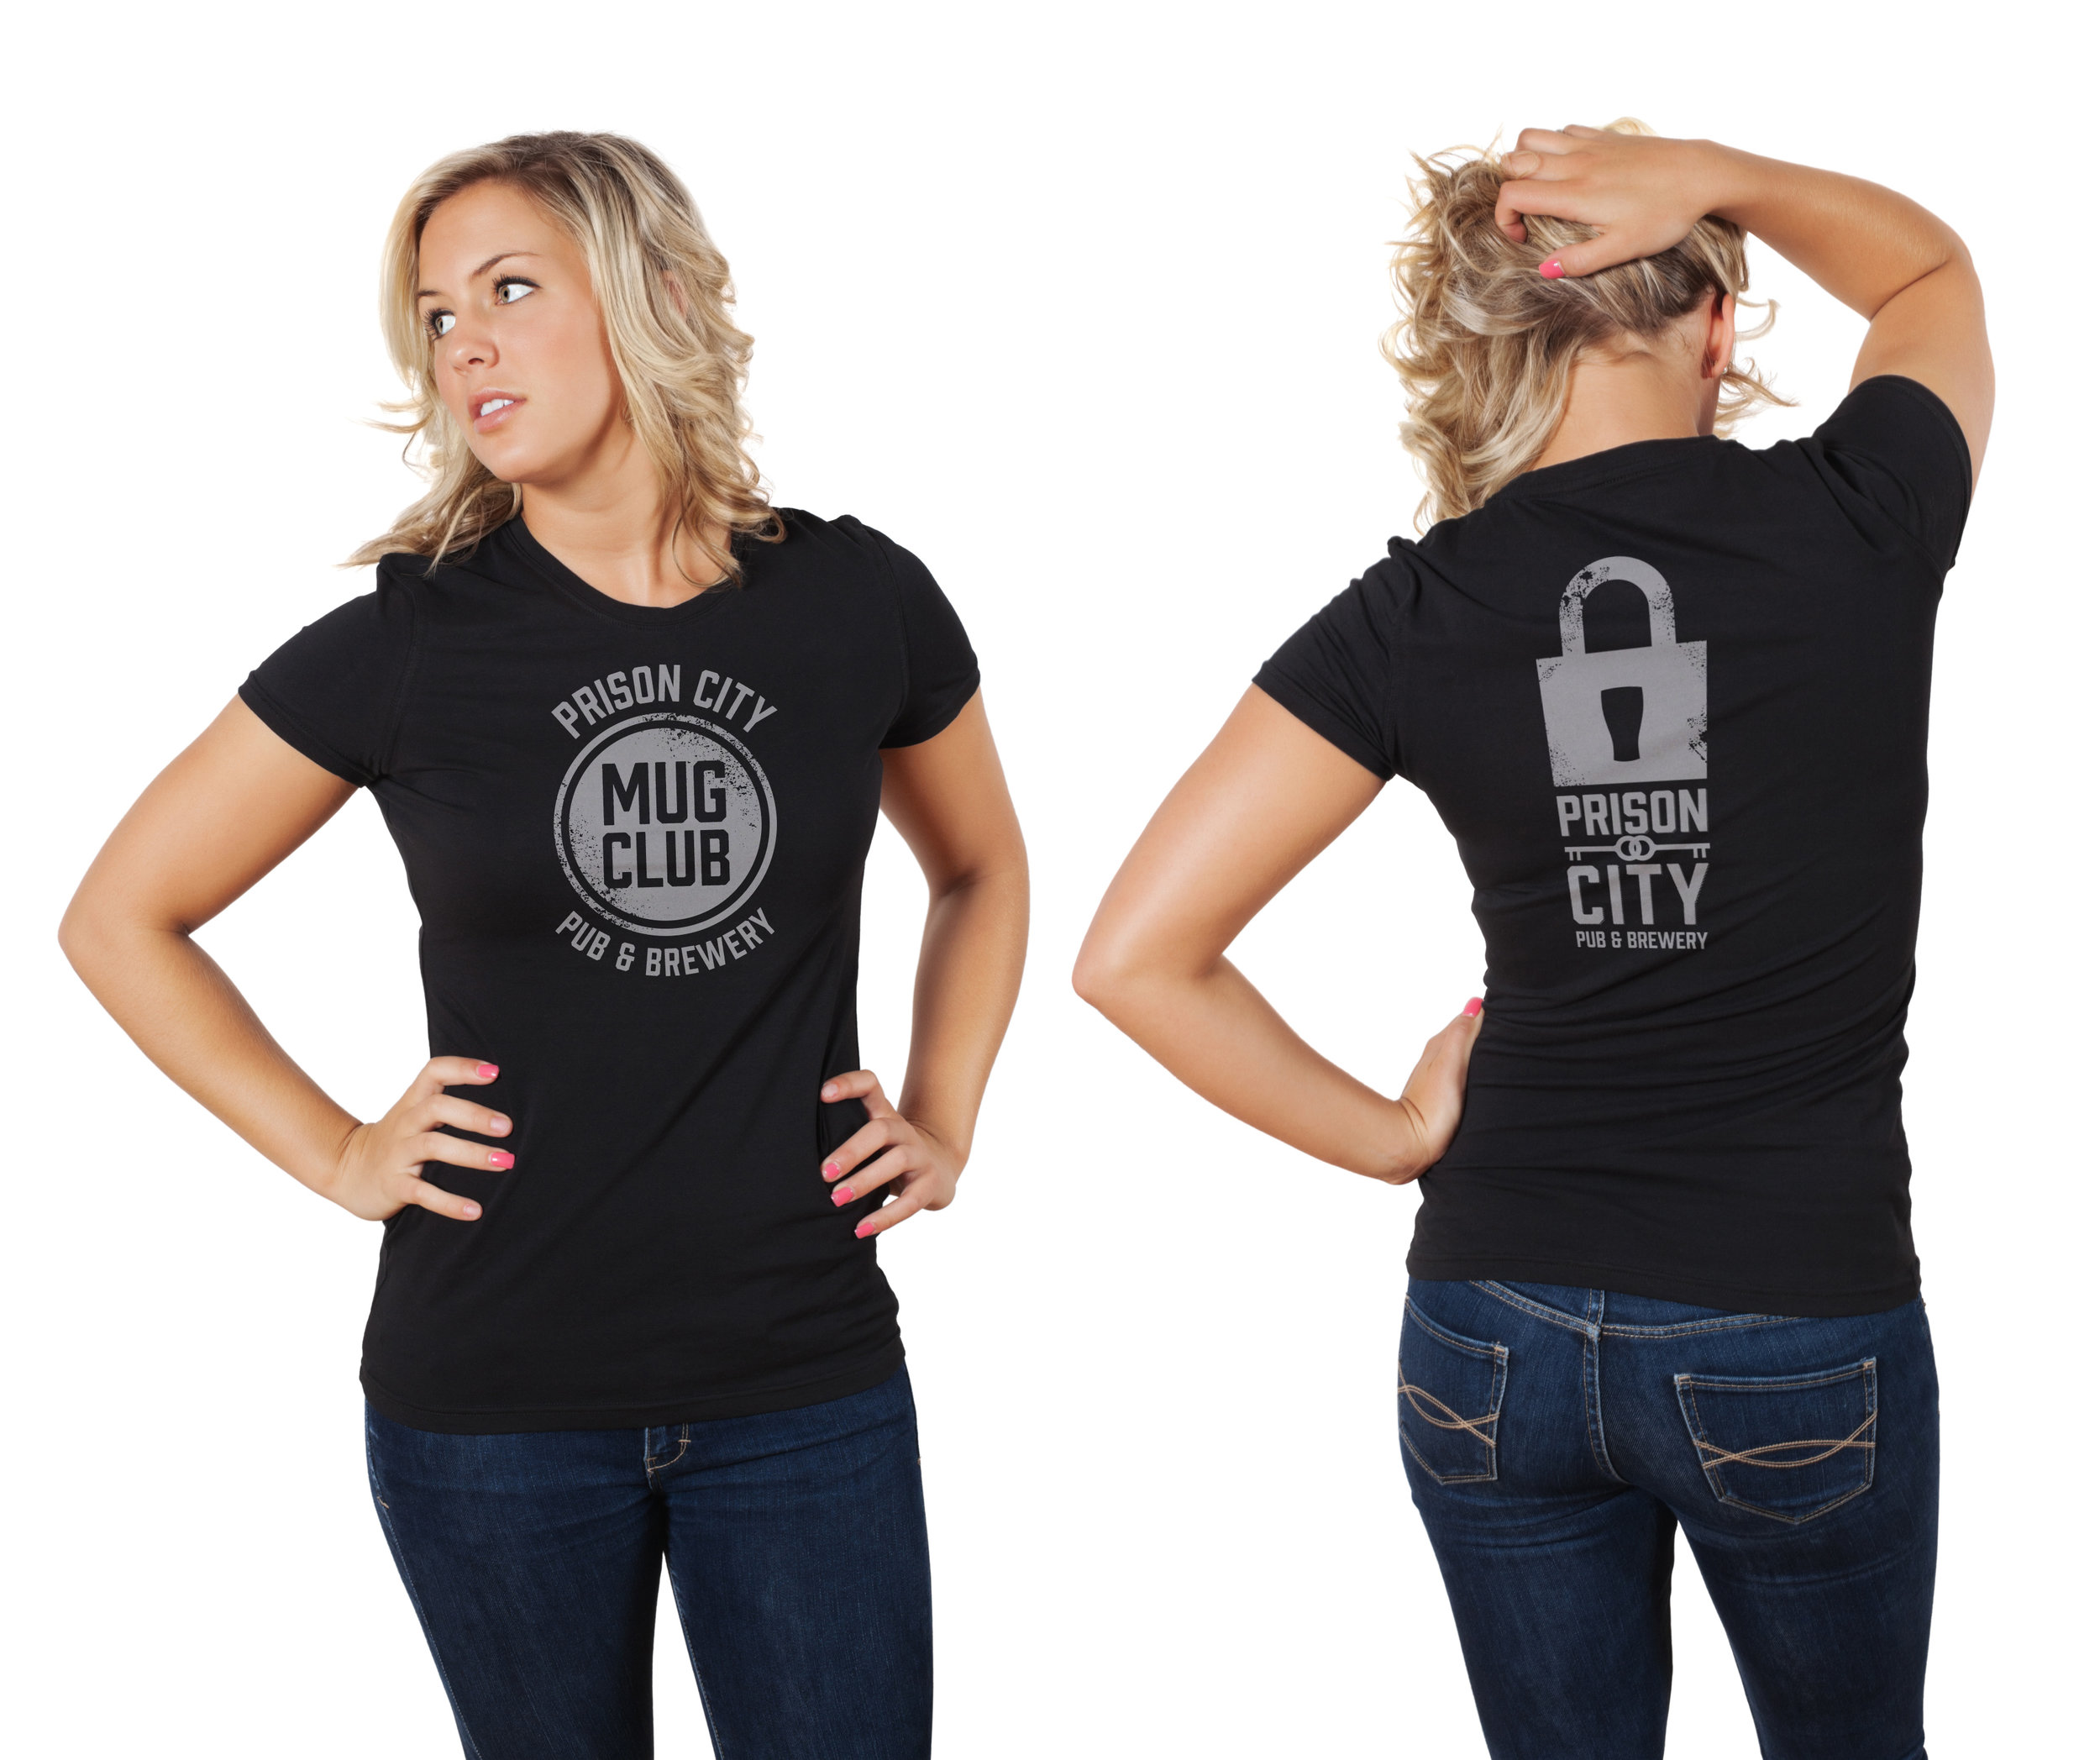 Tshirt Design, T-Shirt Design, Tee Shirt Design